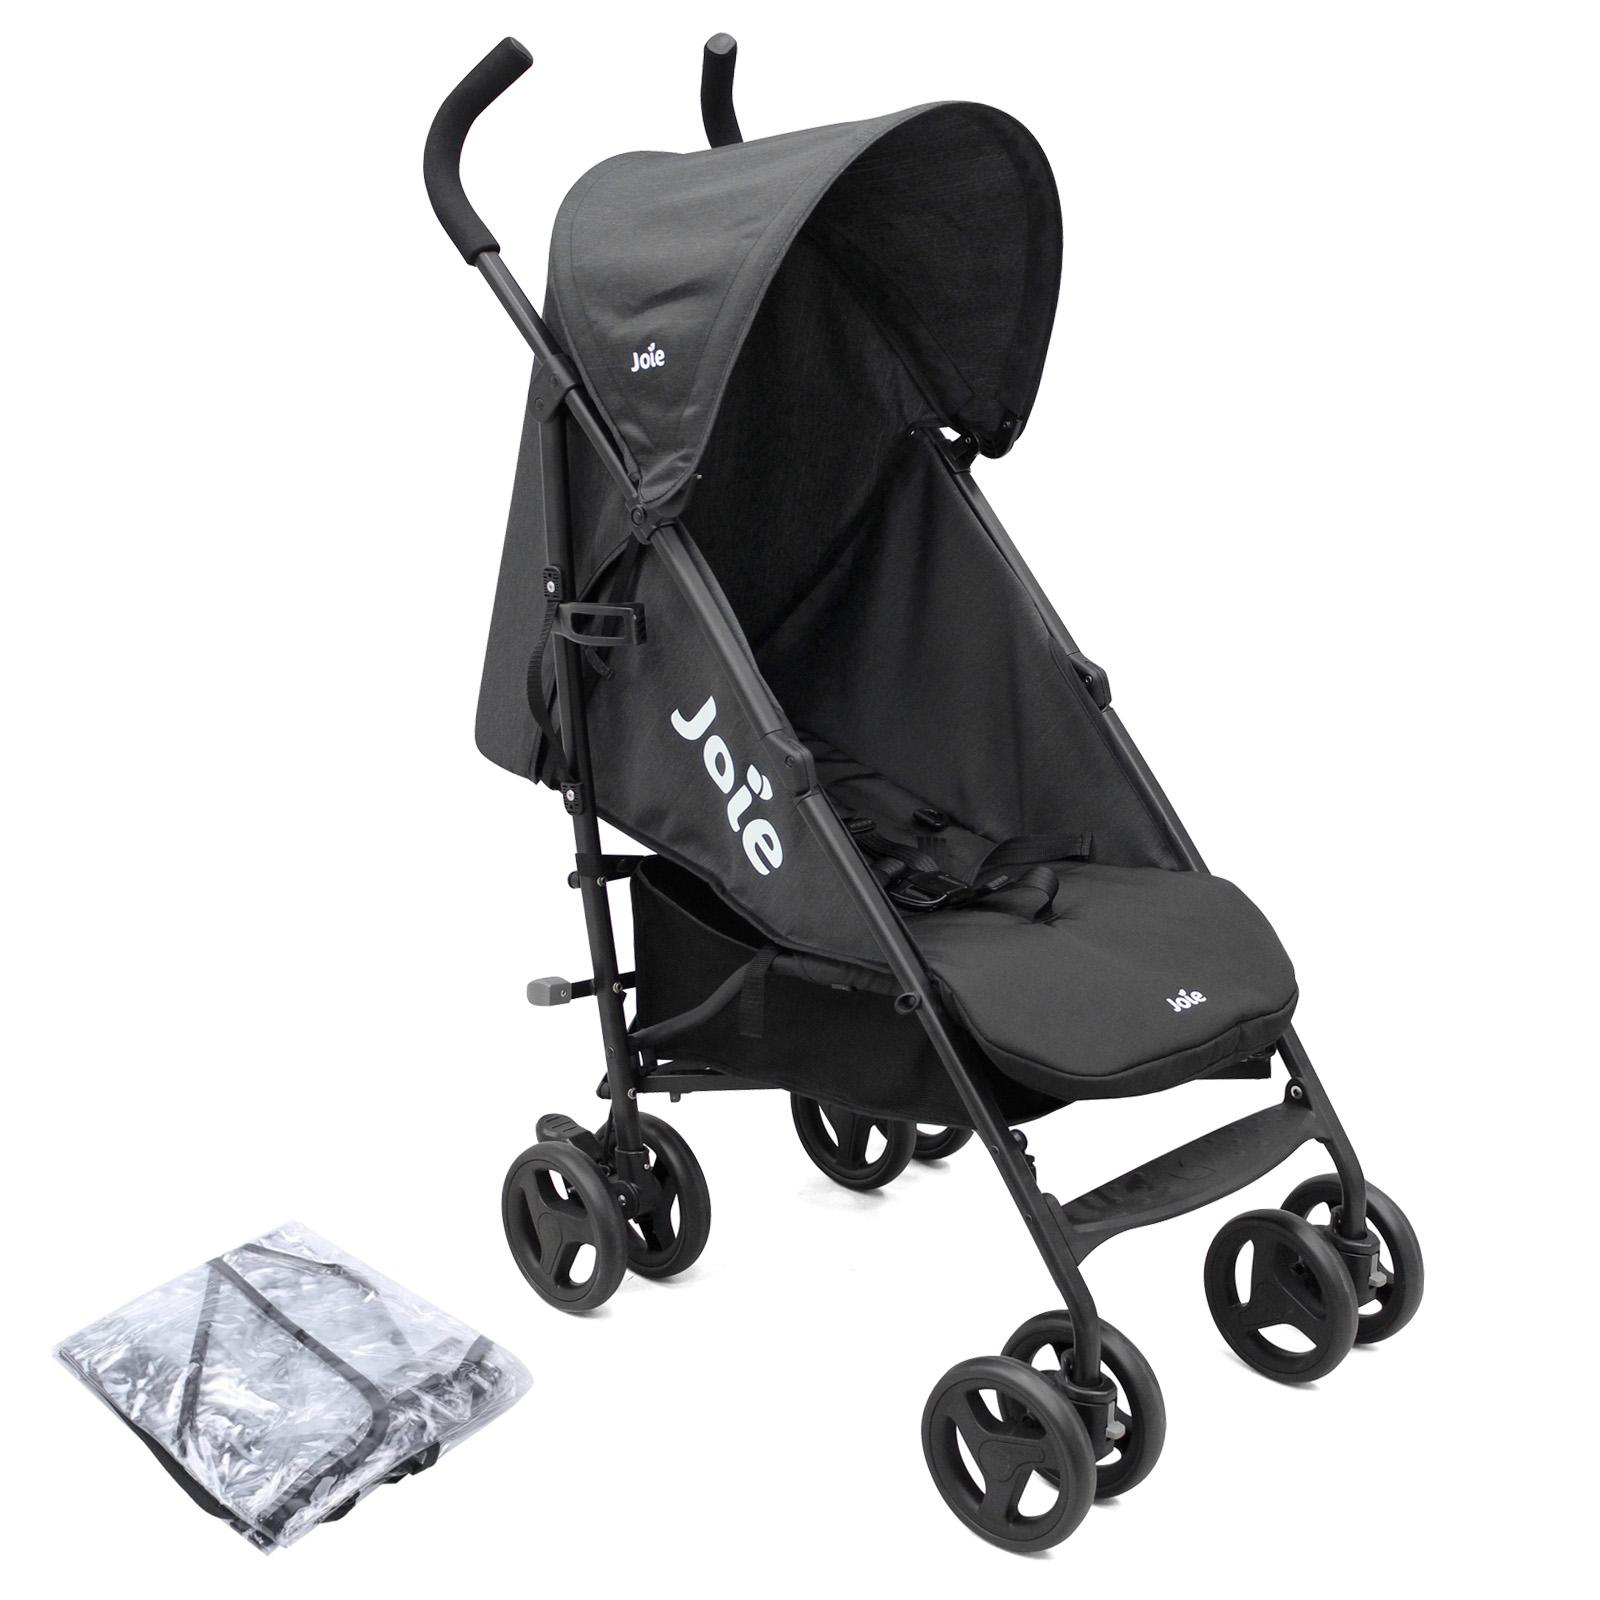 Joie Nitro Pushchair Stroller with Raincover - Black | Buy ...